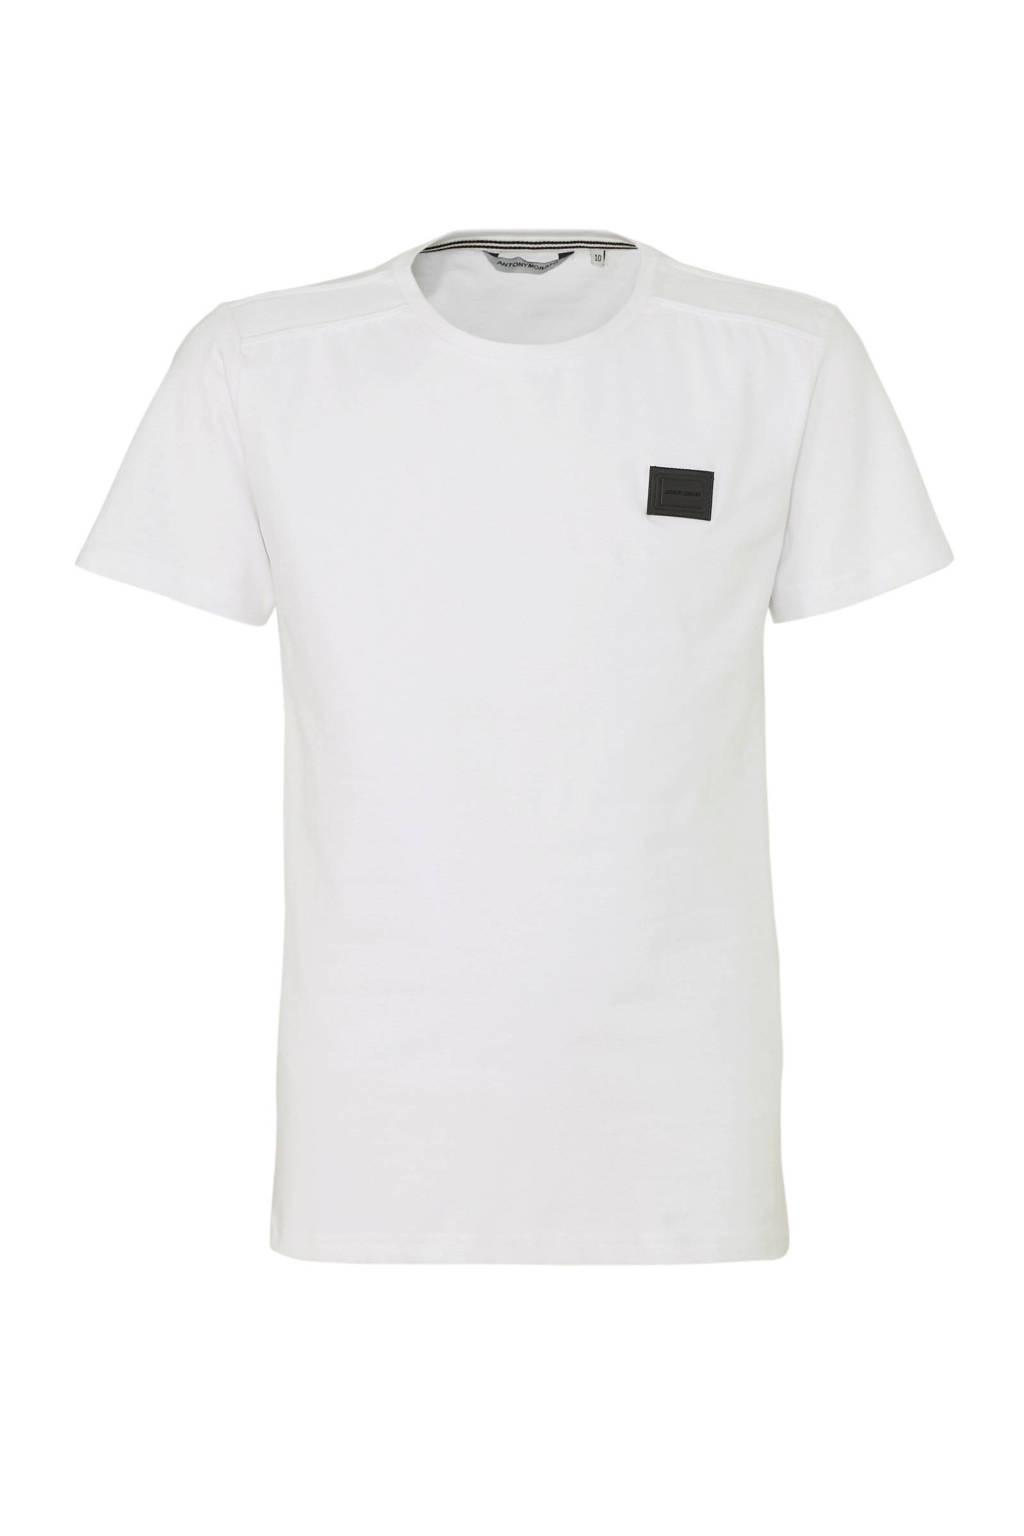 Antony Morato T-shirt wit/zwart, Wit/zwart